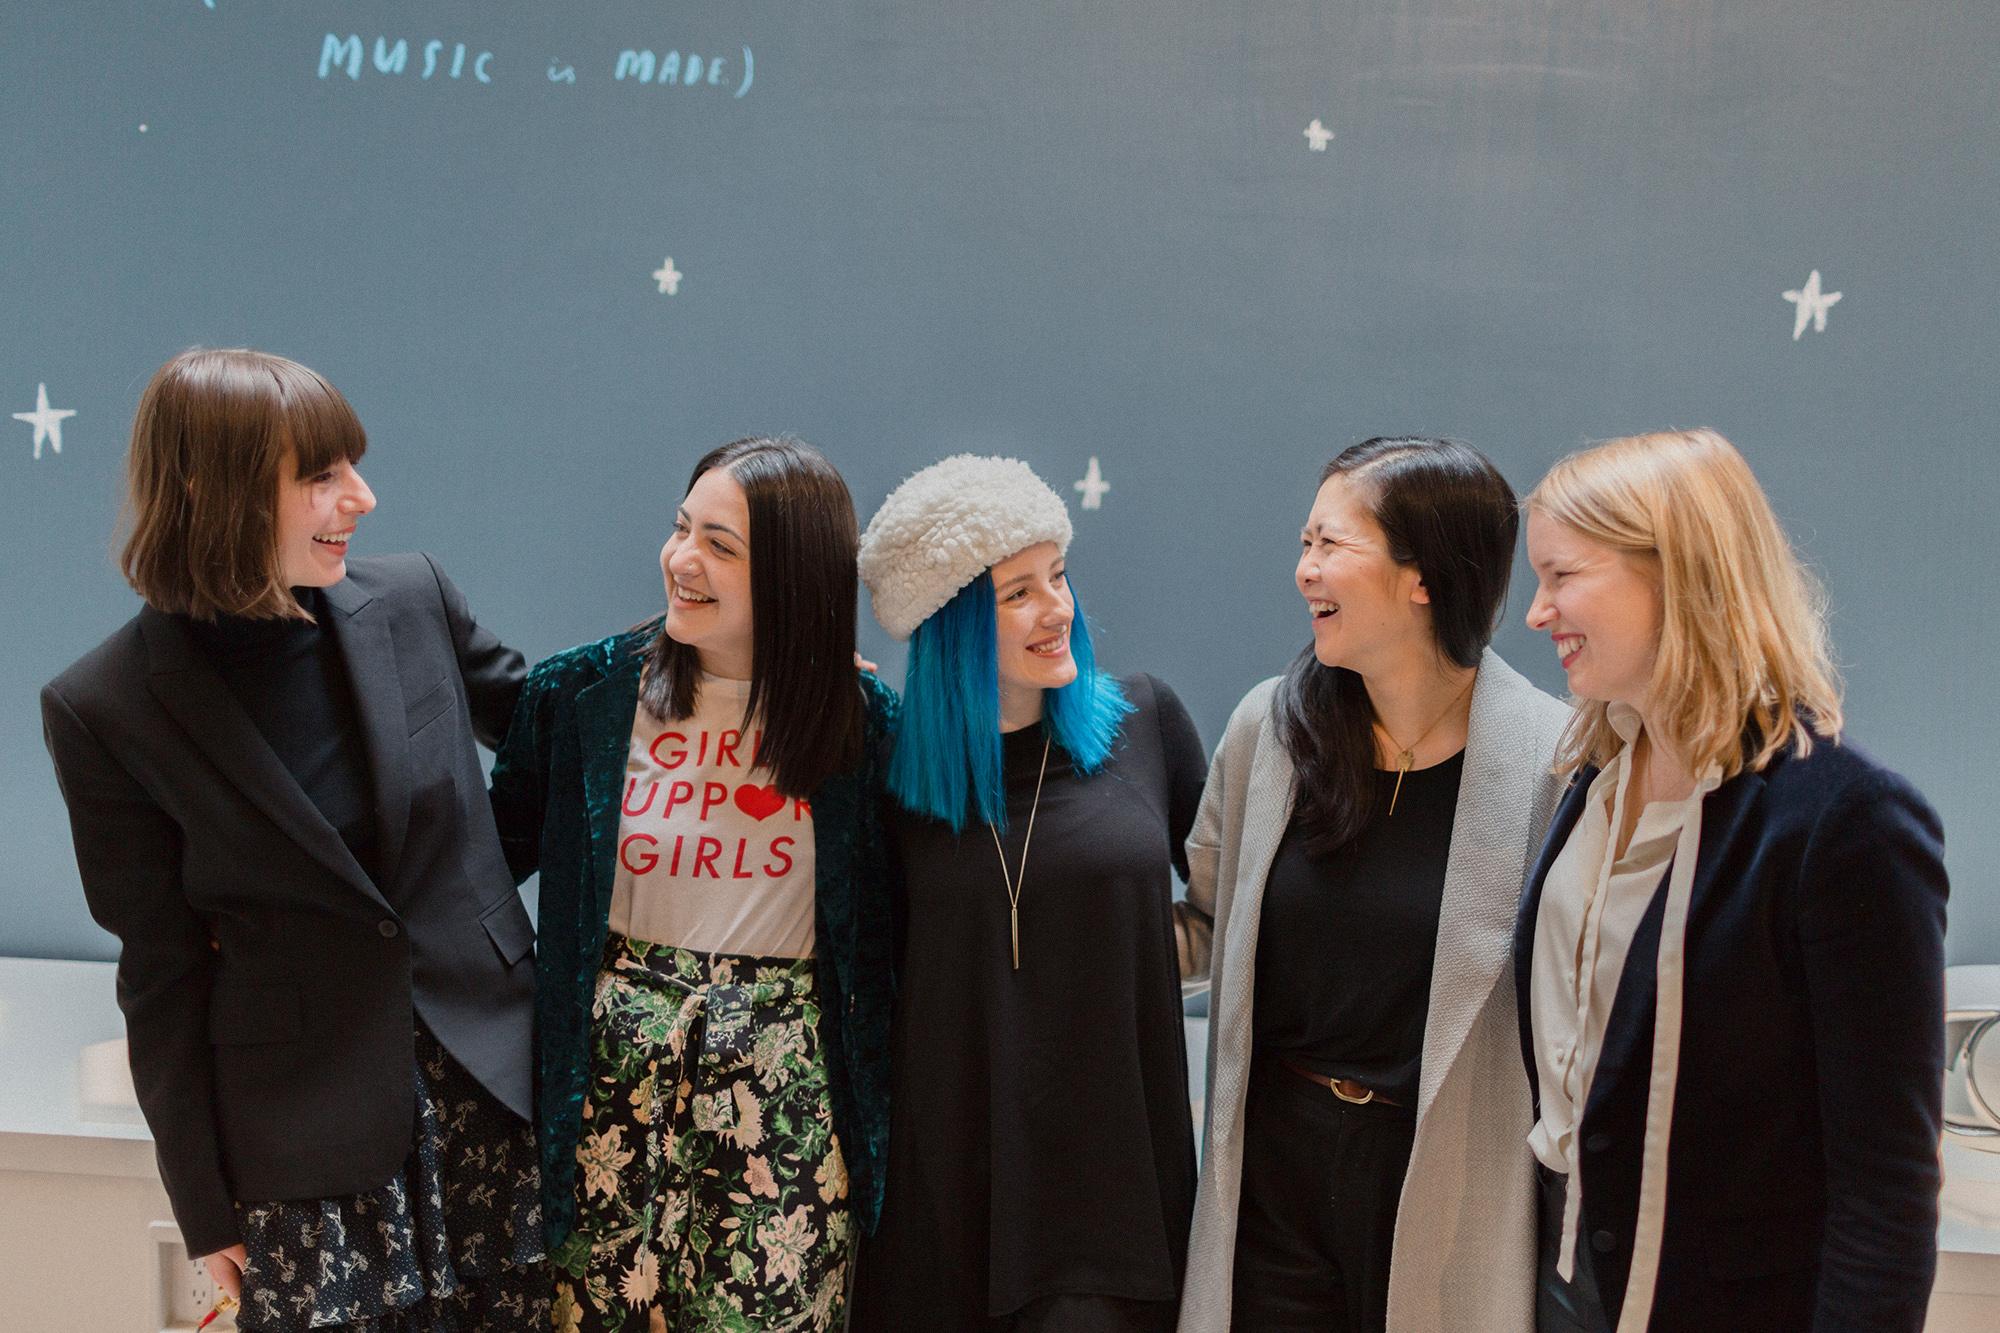 Rachel Schwartzmann, Emma Gray, Dalila Mujagic, Tze Chun, and Melody Serafino